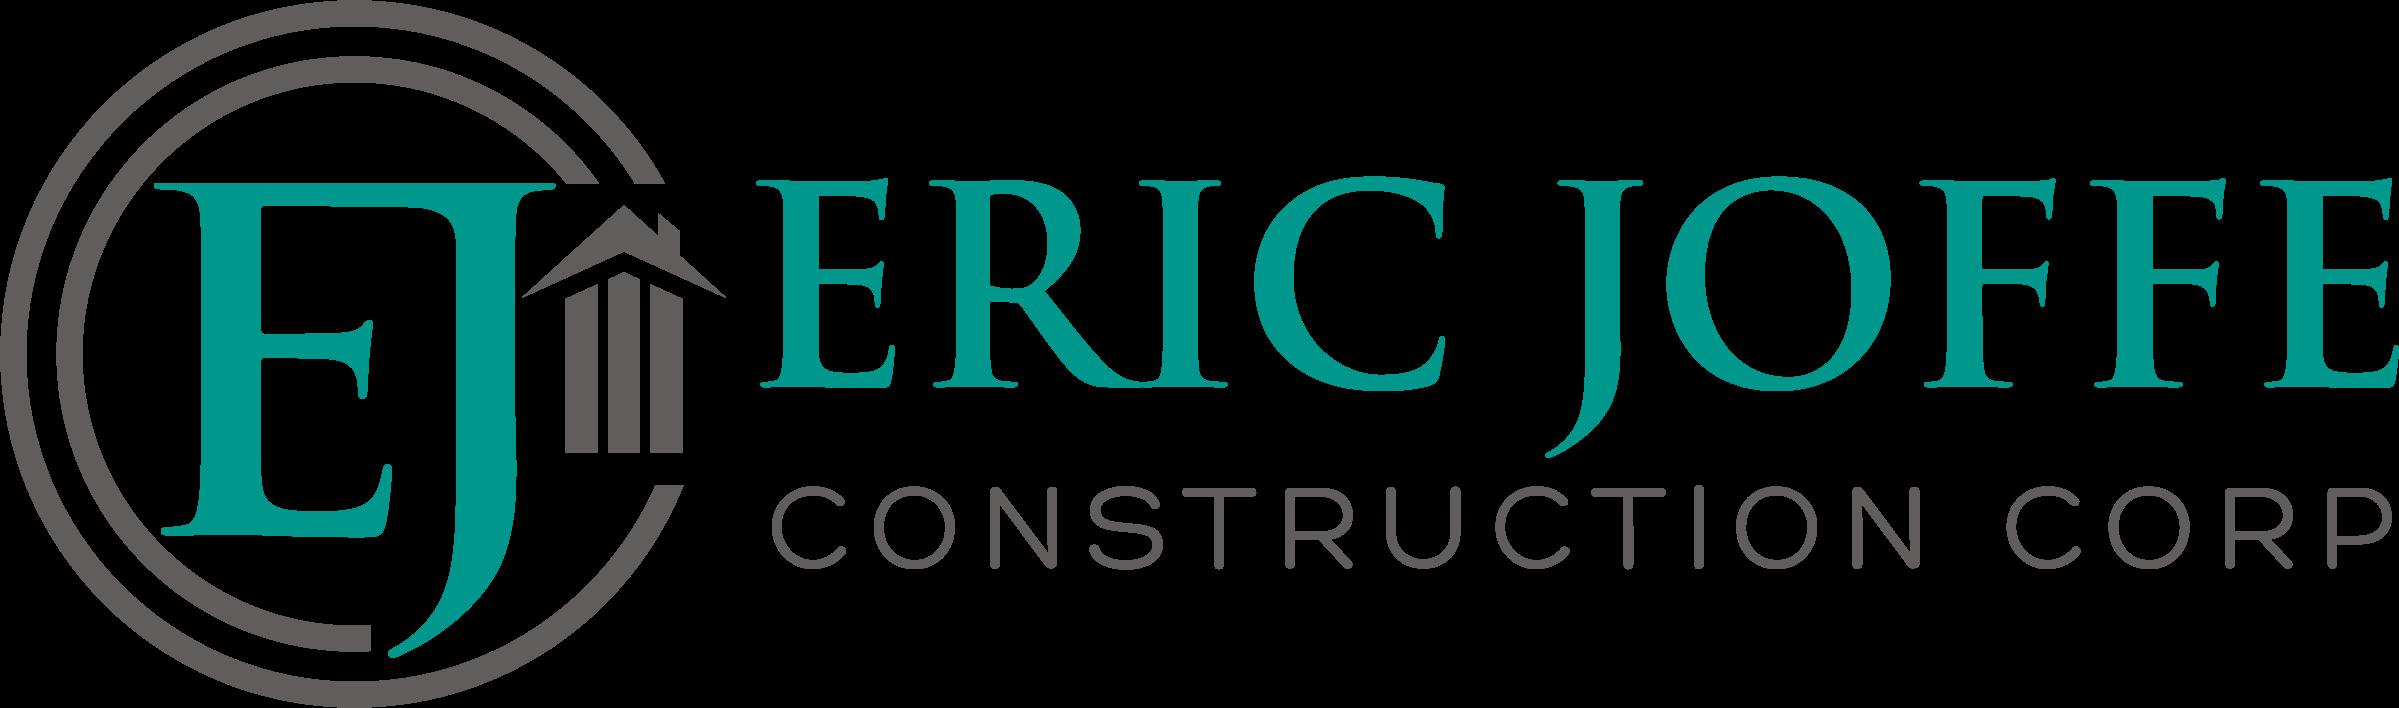 Eric Joffe Construction Corp